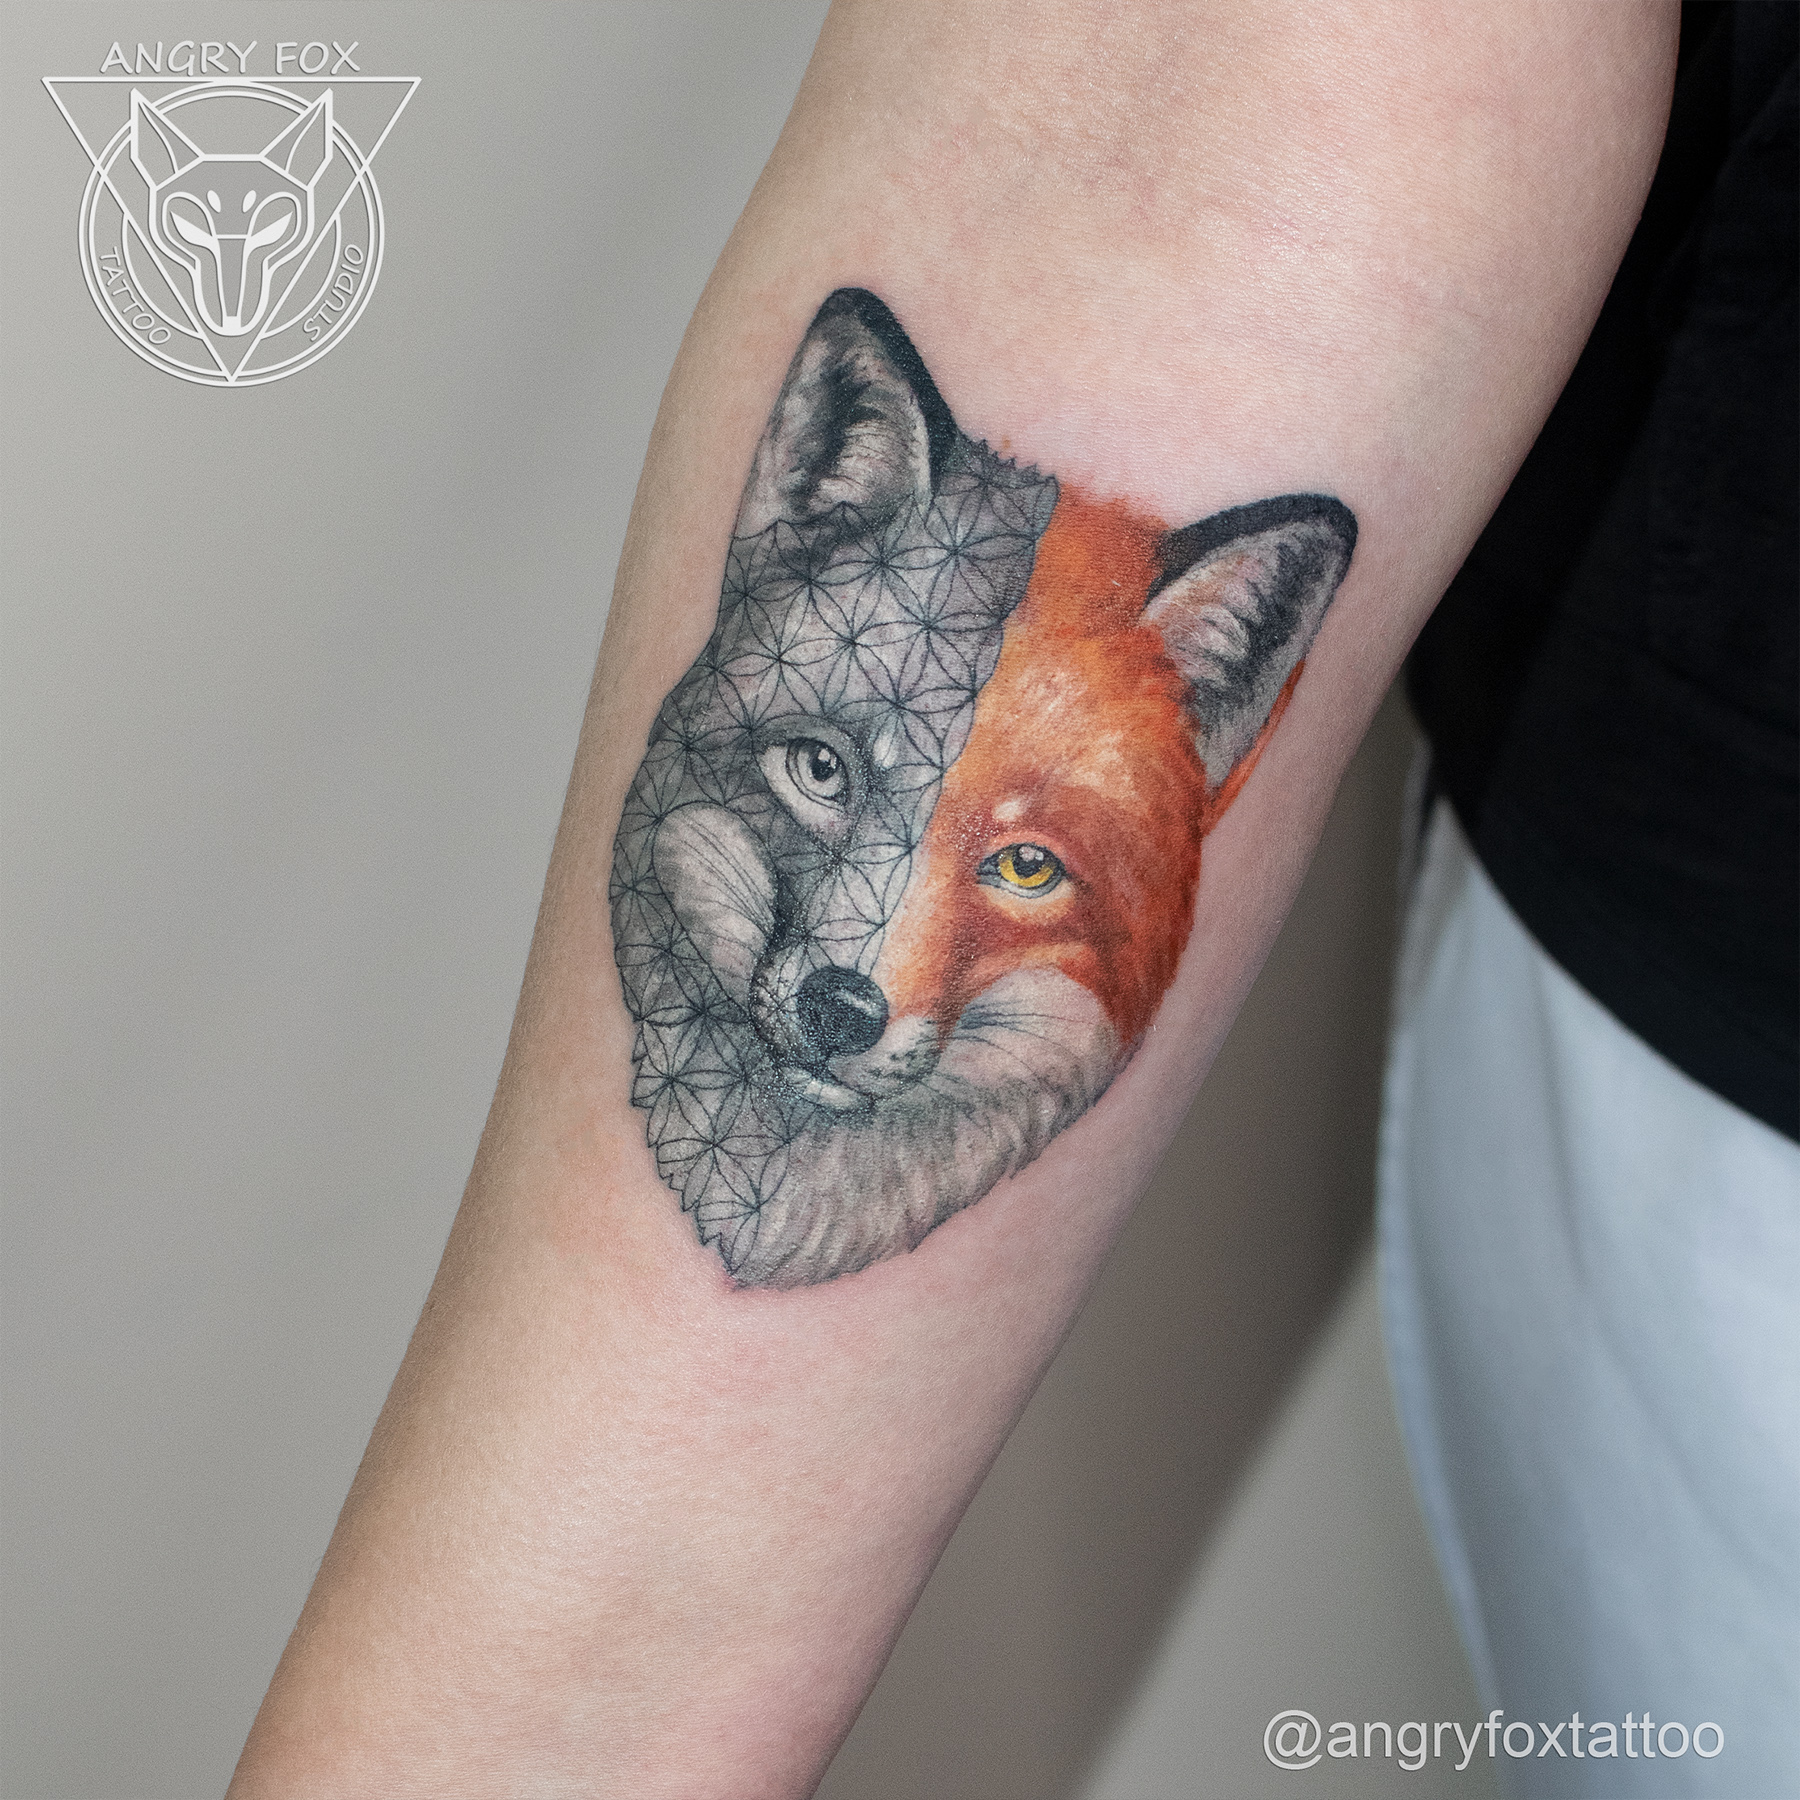 татуировка, тату, предплечье, рука, реализм, графика, лиса